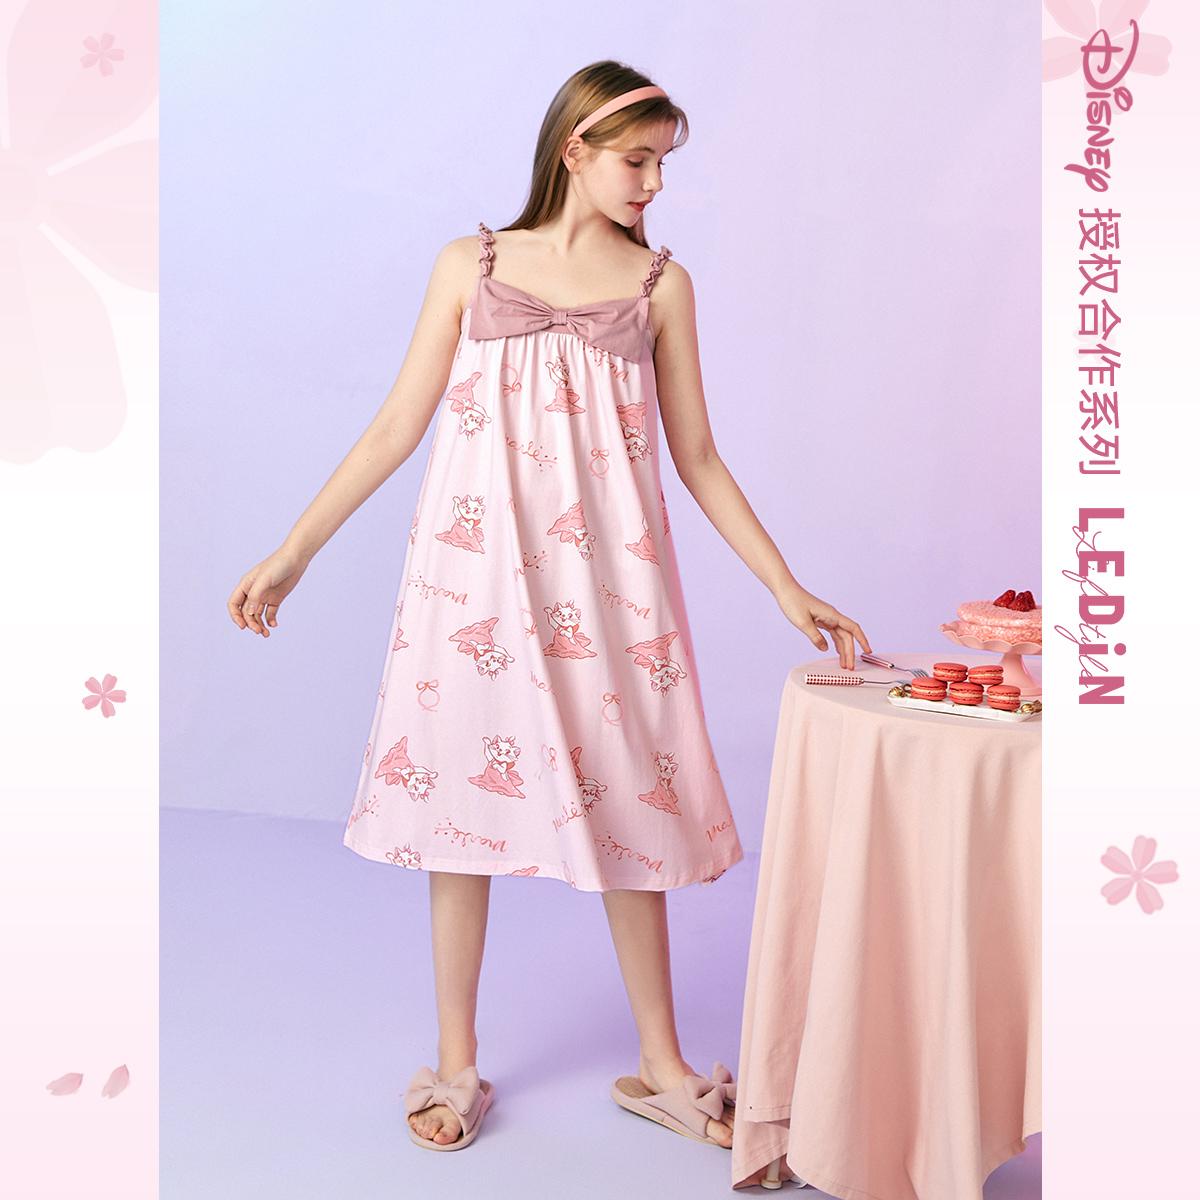 LEDIN 乐町 CLFAB2208 玛丽猫联名 女士吊带睡衣裙